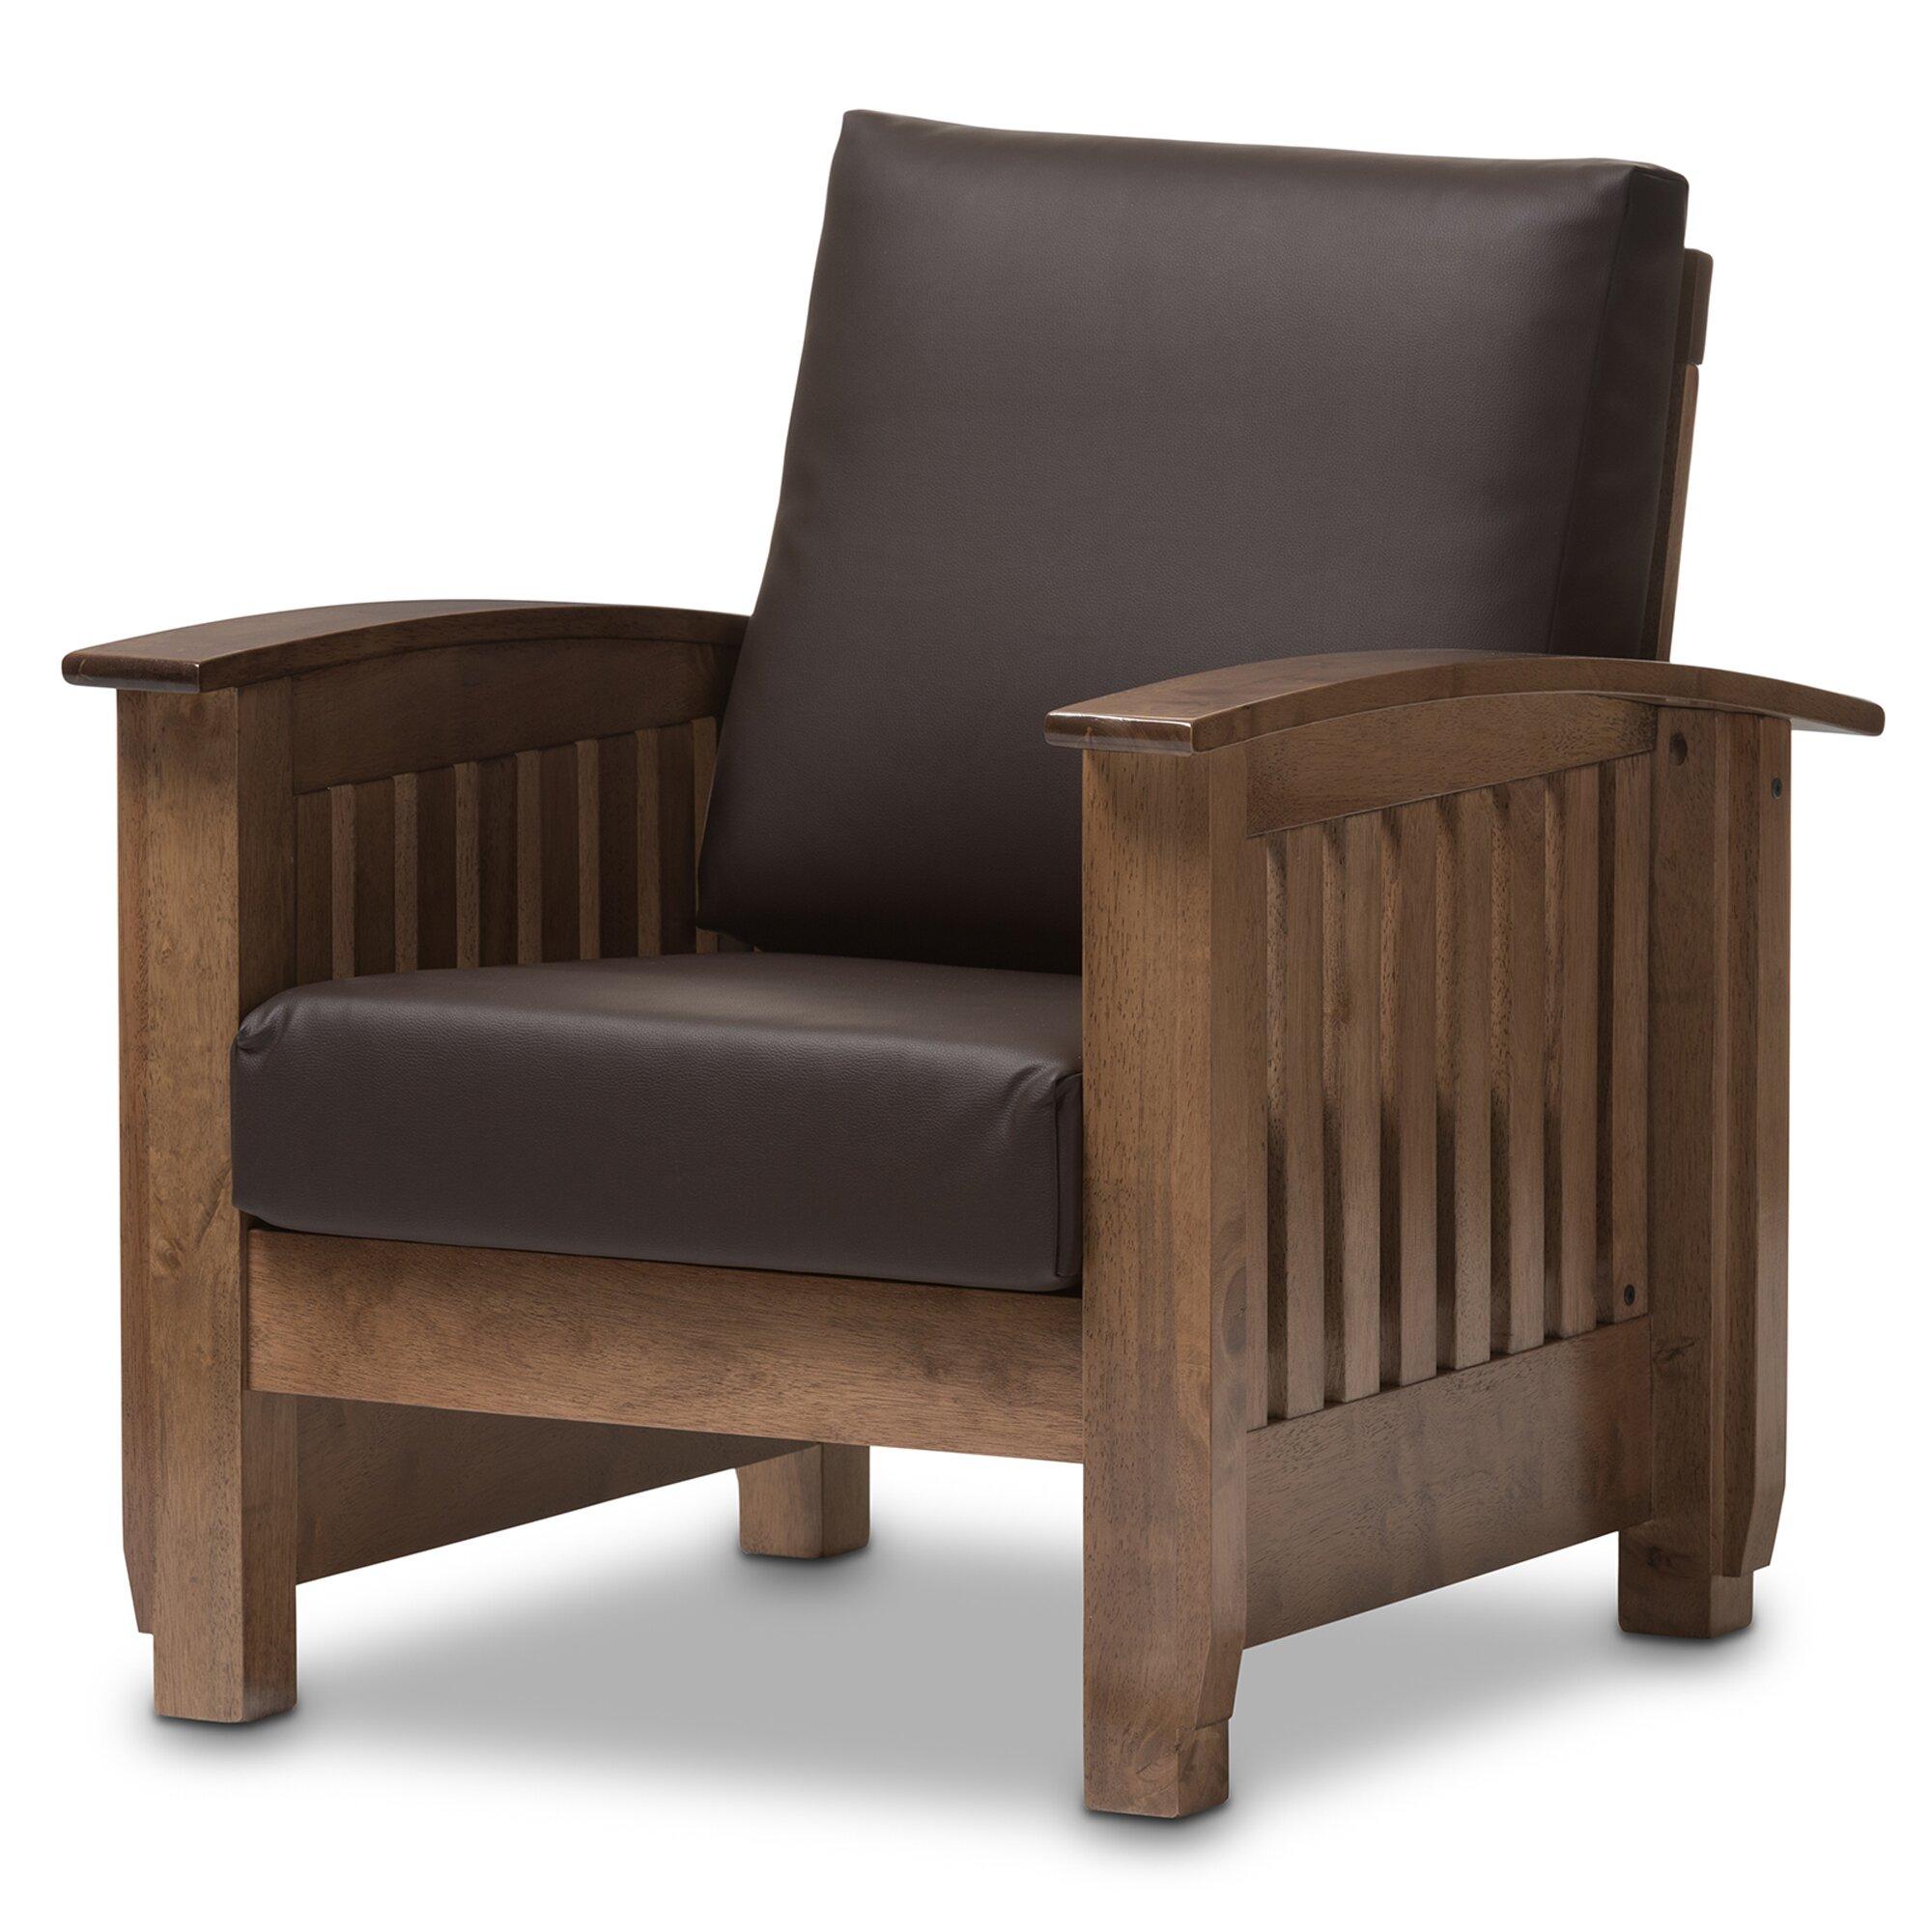 wholesale interiors baxton studio benigno faux leather arm chair baxton studio lounge chair